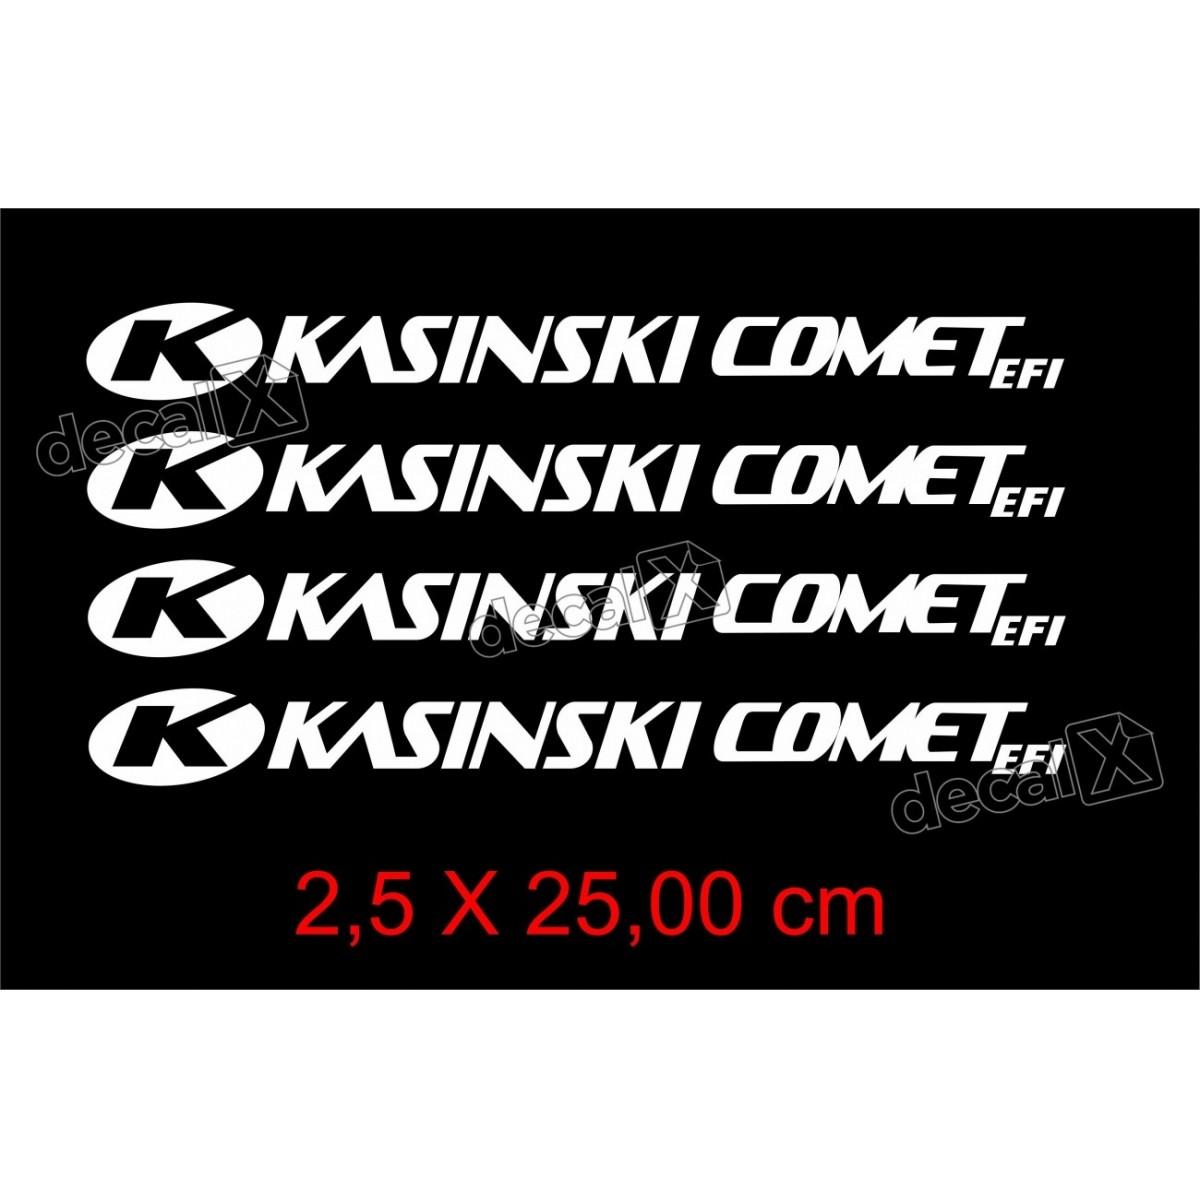 Adesivos Centro Roda Refletivo Moto Kasinski Comet Efi Rd3